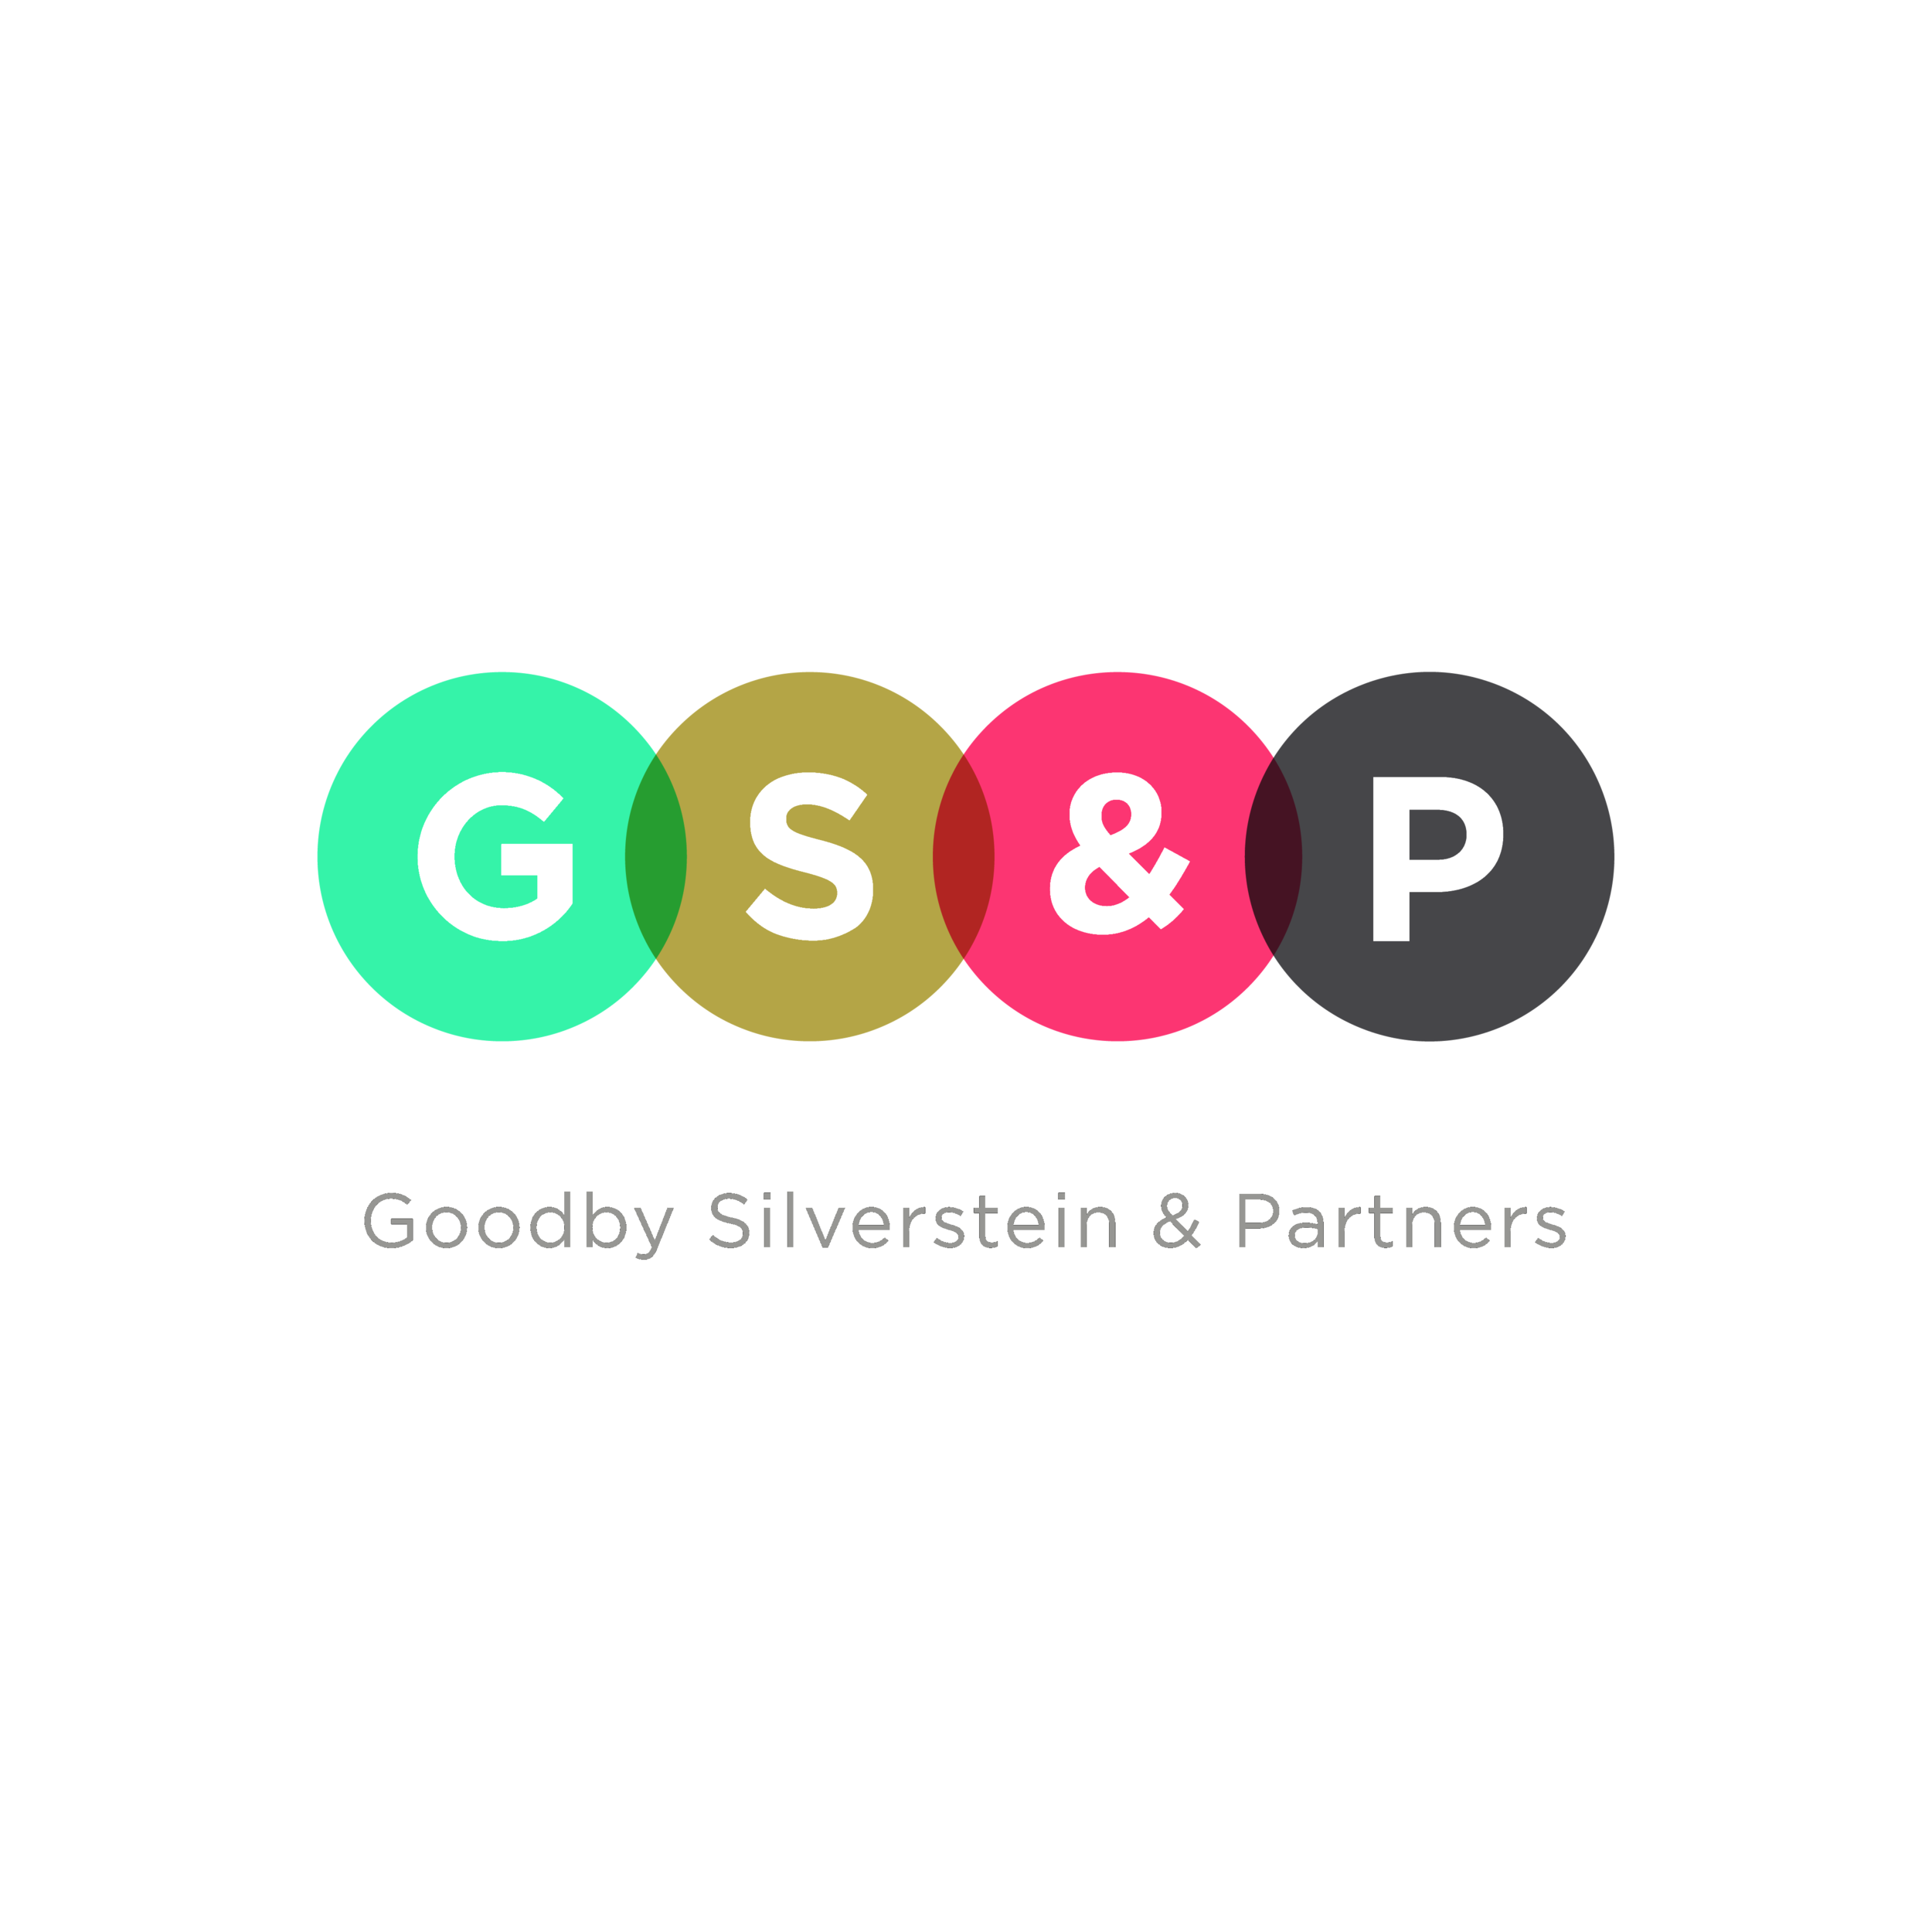 GS&P.logo.png